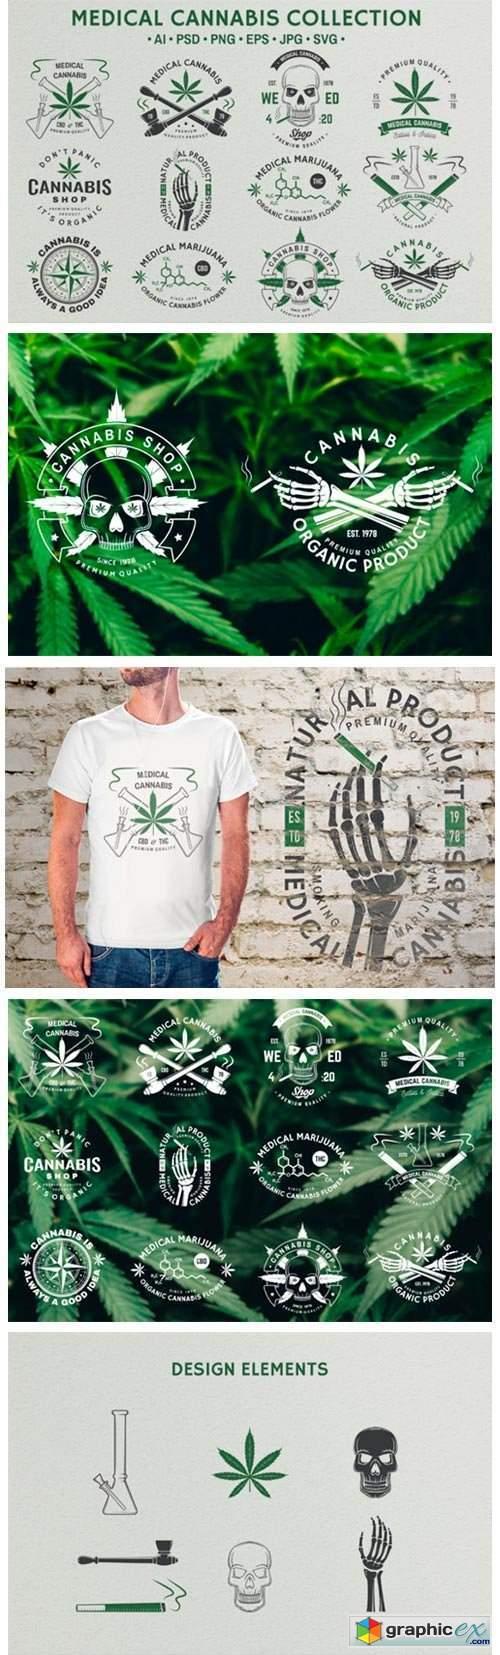 Medical Cannabis Collection